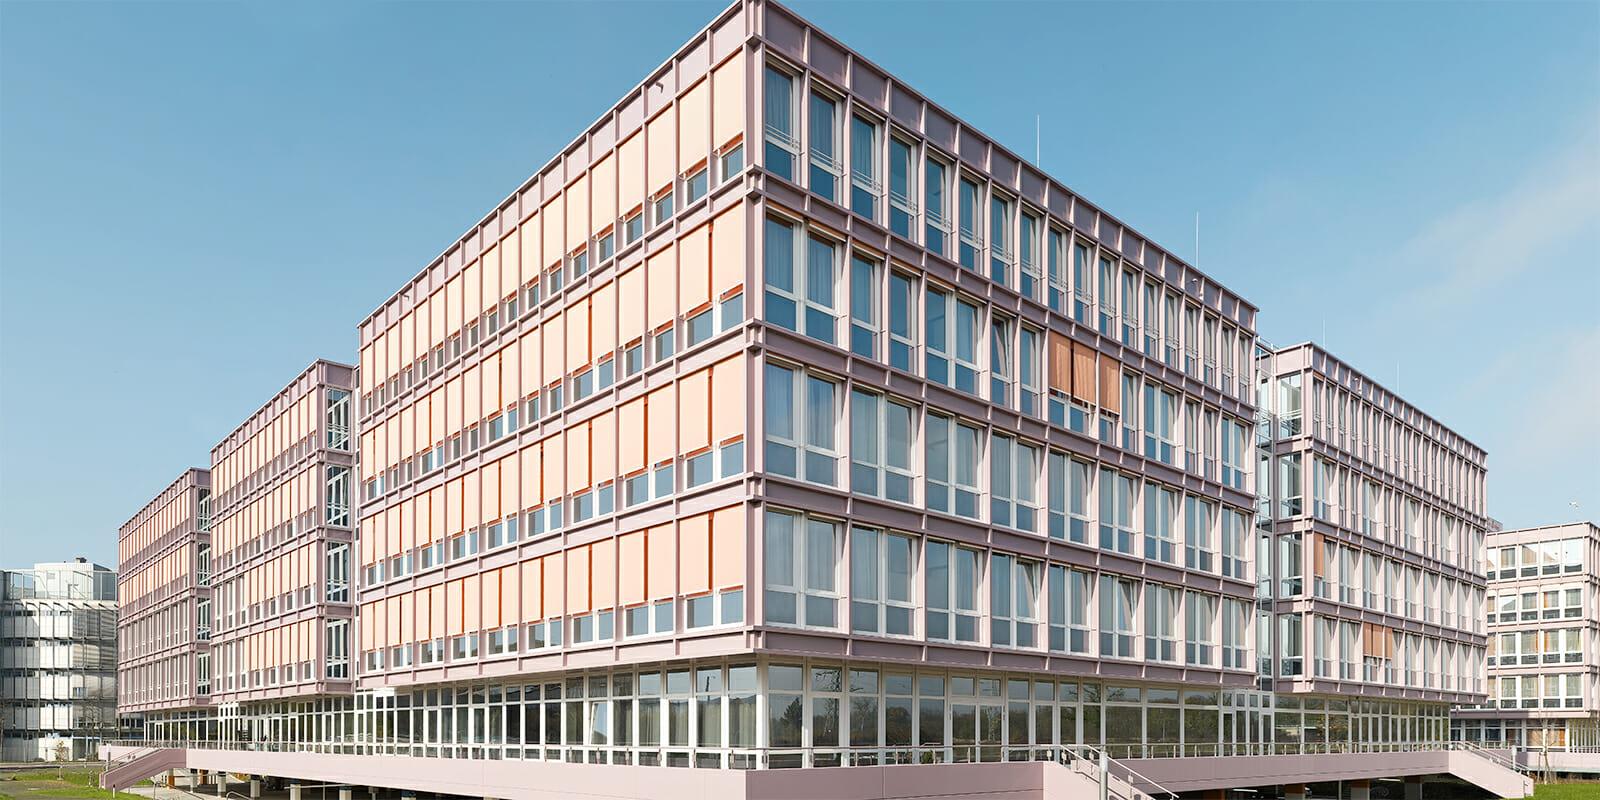 Comfort Hotel , 81677 München